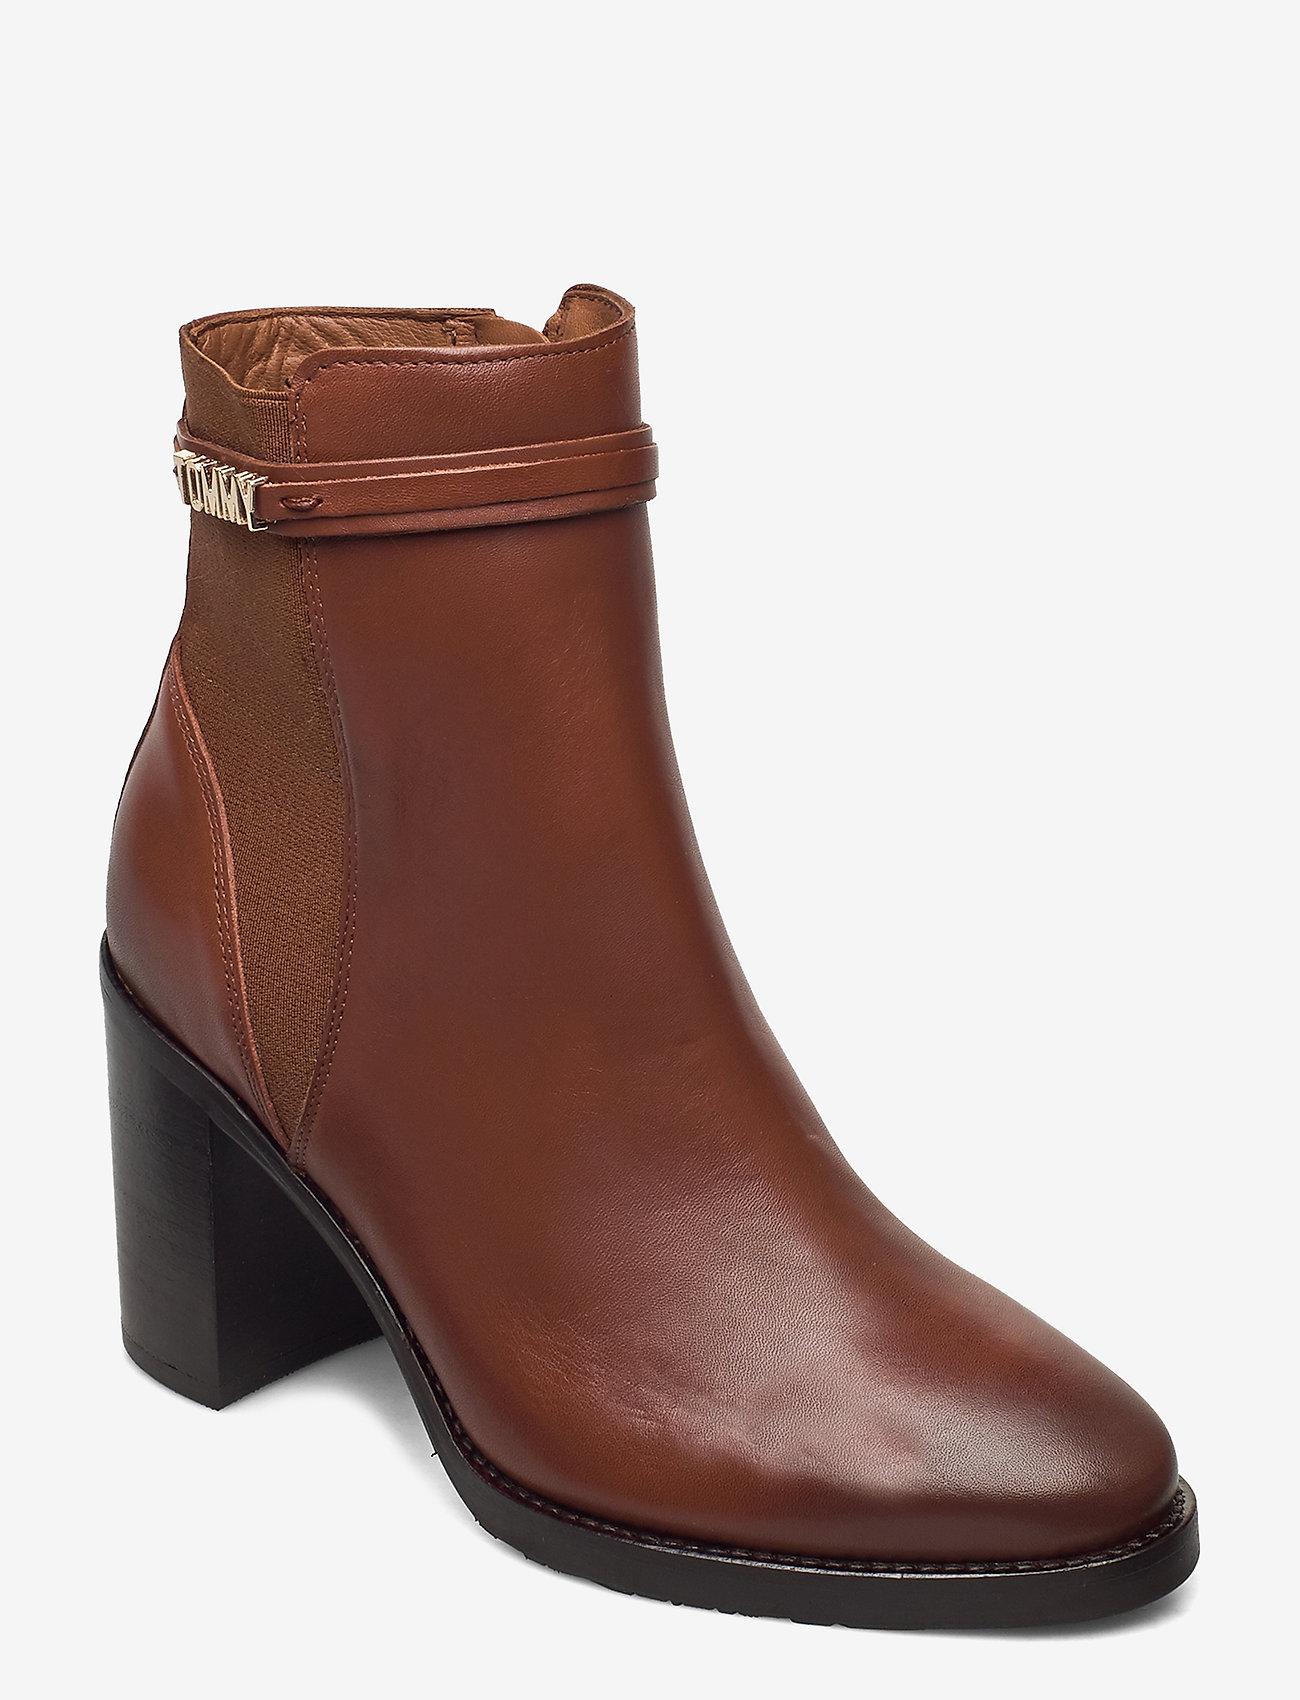 Tommy Hilfiger - BLOCK BRANDING HIGH HEEL BOOT - heeled ankle boots - pumpkin paradise - 0